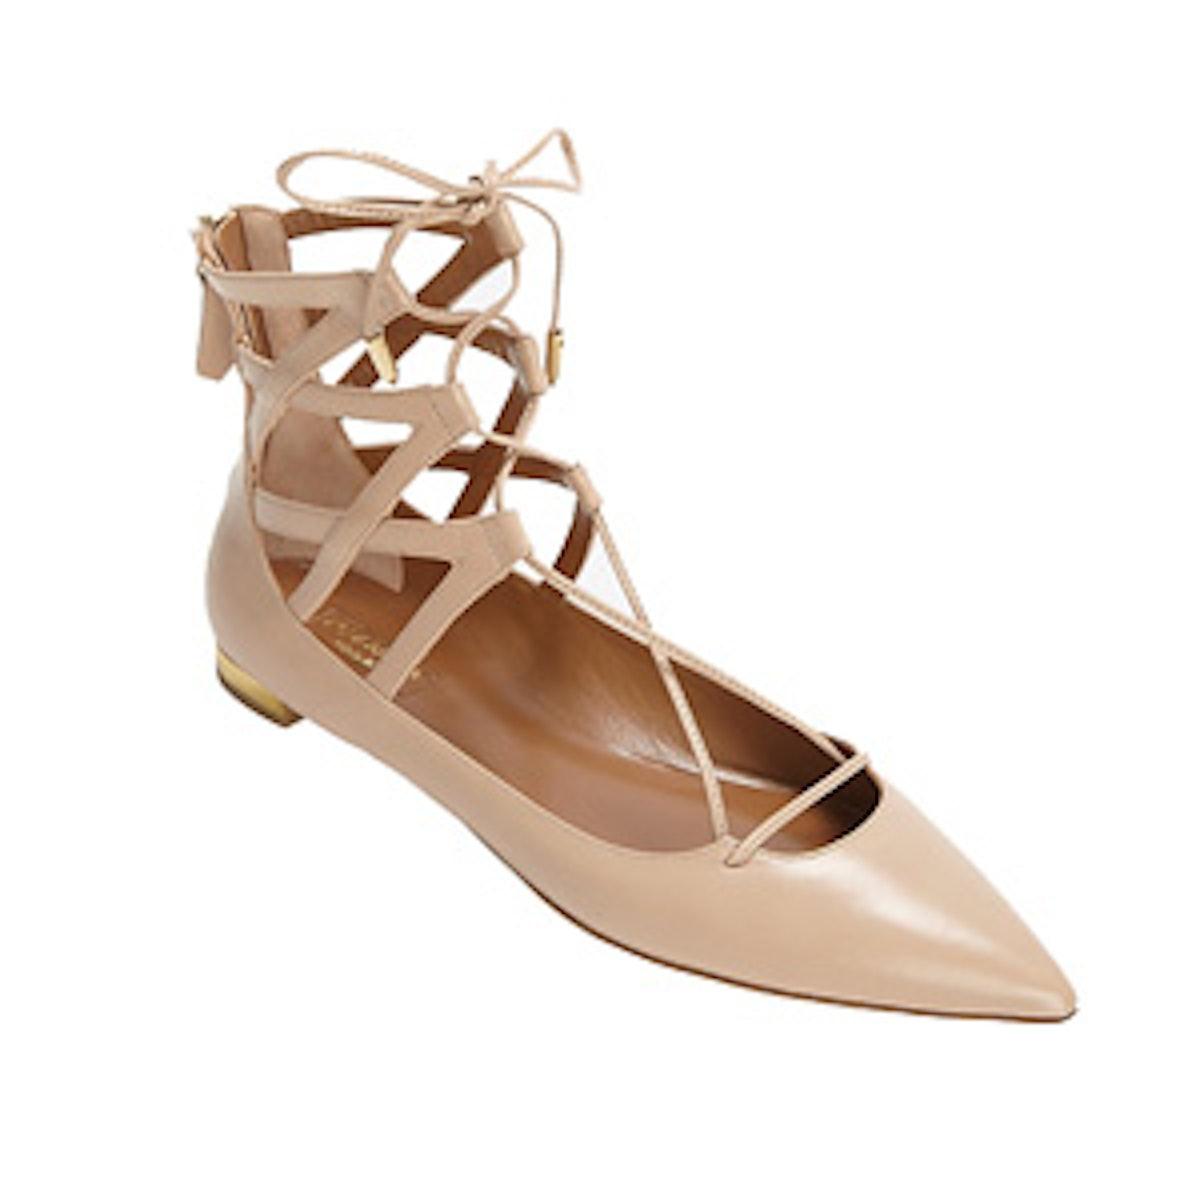 Lace-Up Ballerina Flats